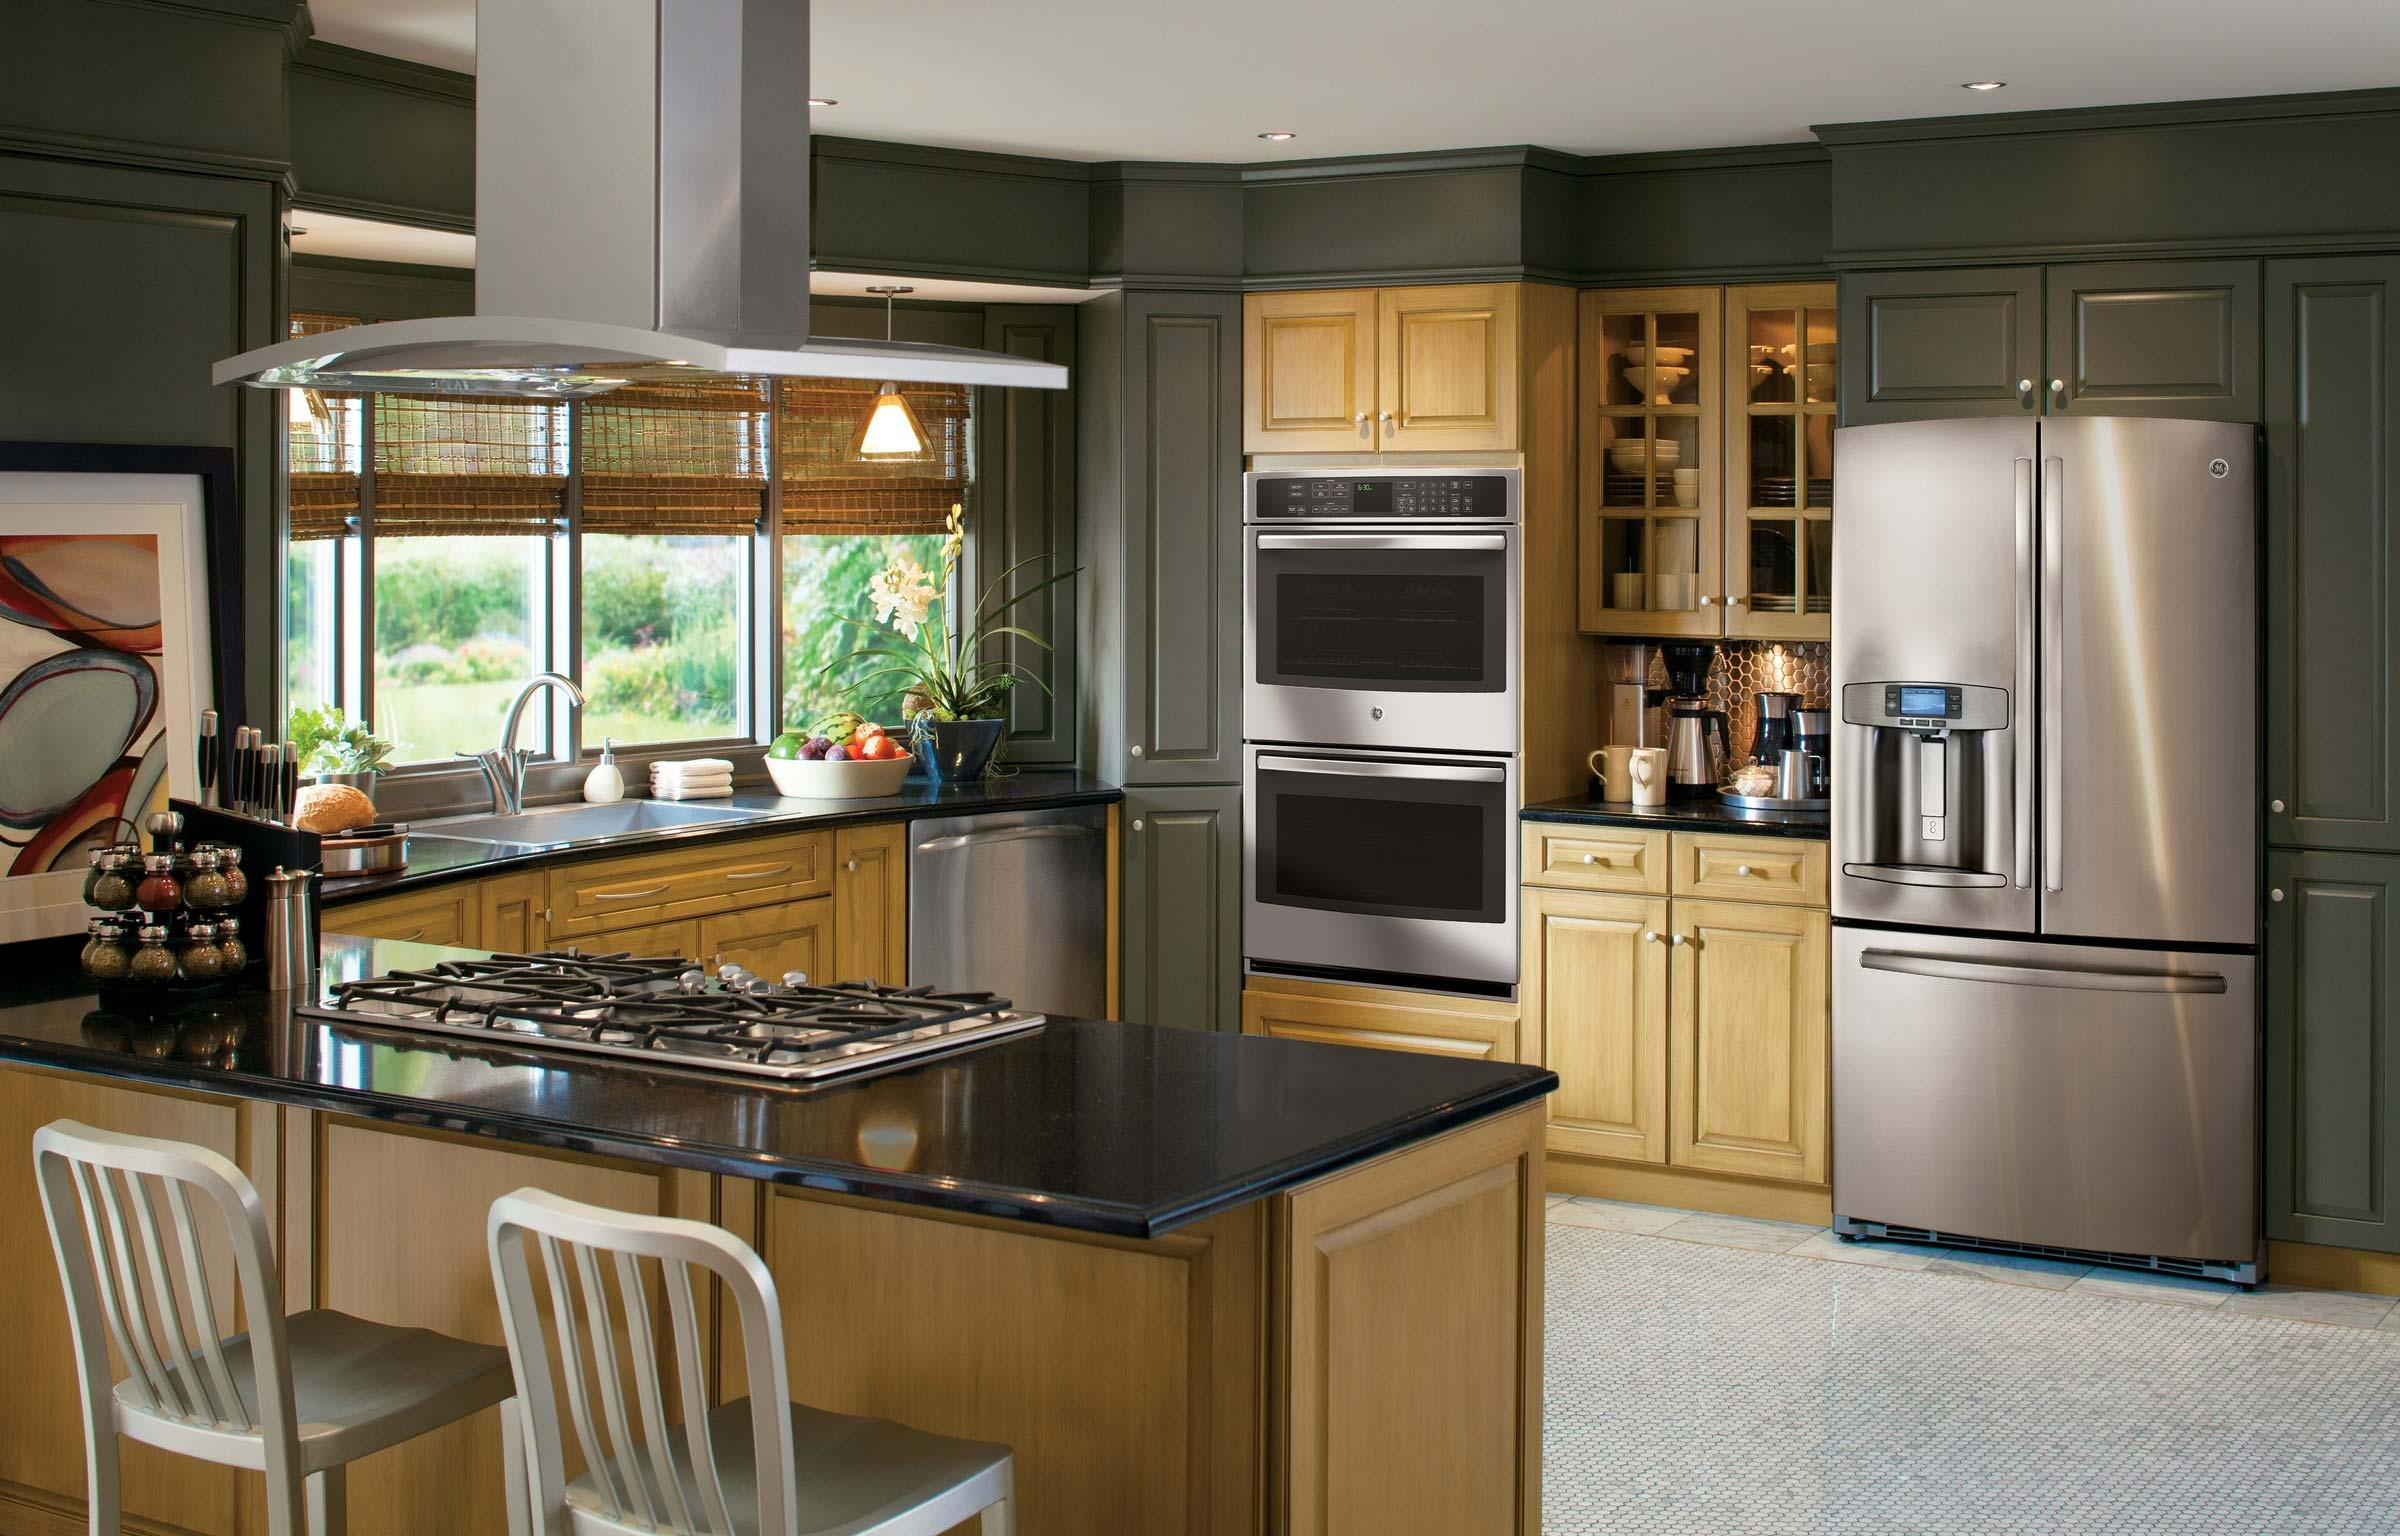 Green kitchen appliances Photo - 12